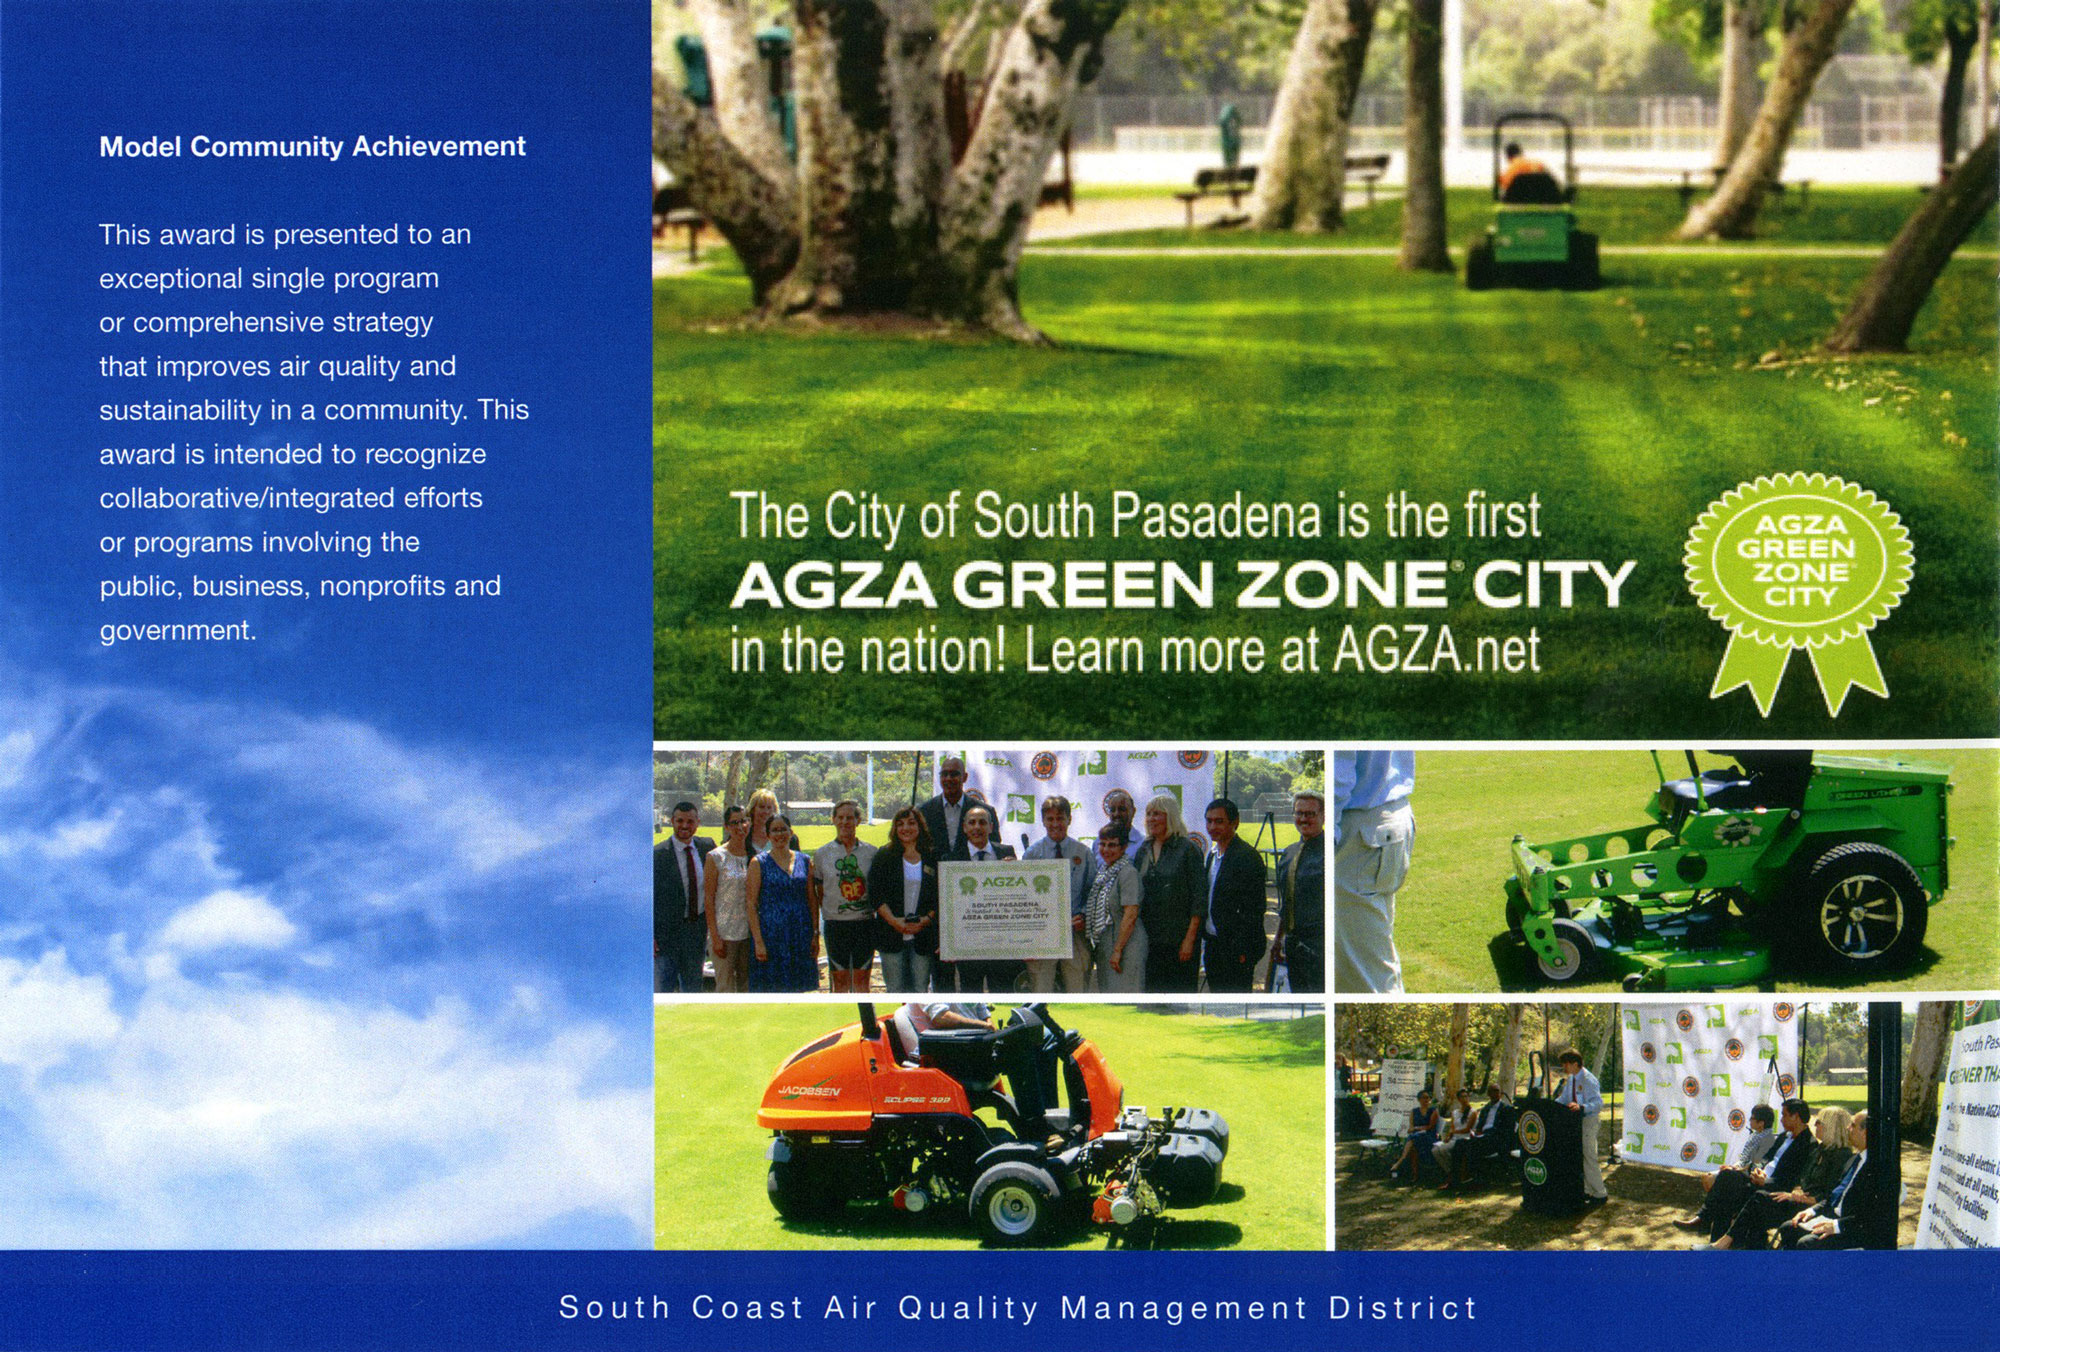 AGZA_PIX_SCAQMD_Clean_Air_Awards_03_Booklet_02_2000+MARGIN.jpg